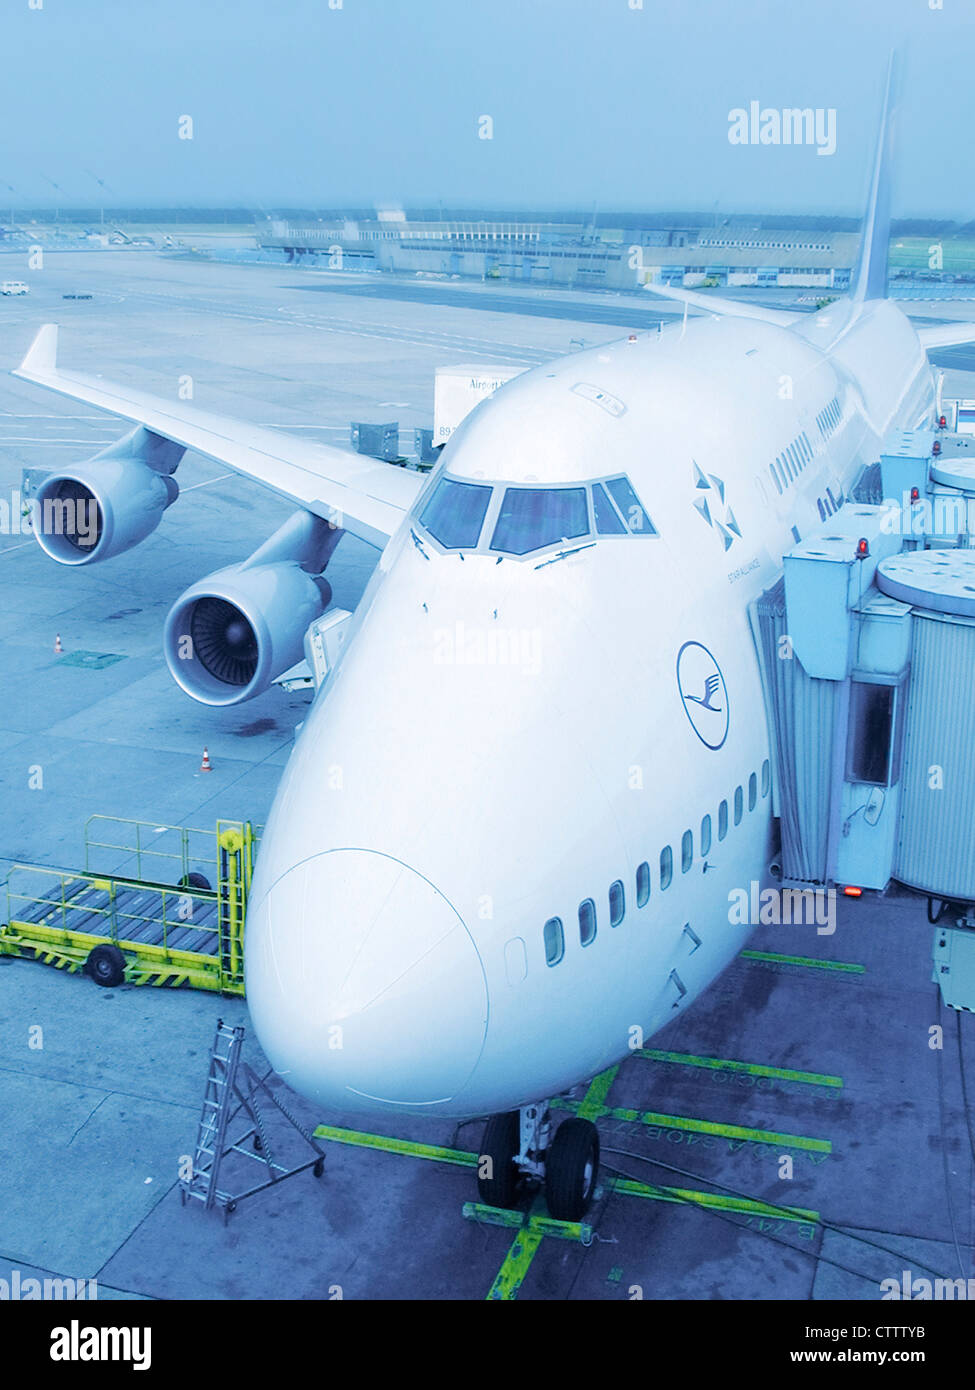 Flugzeuge Stockfotos & Flugzeuge Bilder - Alamy